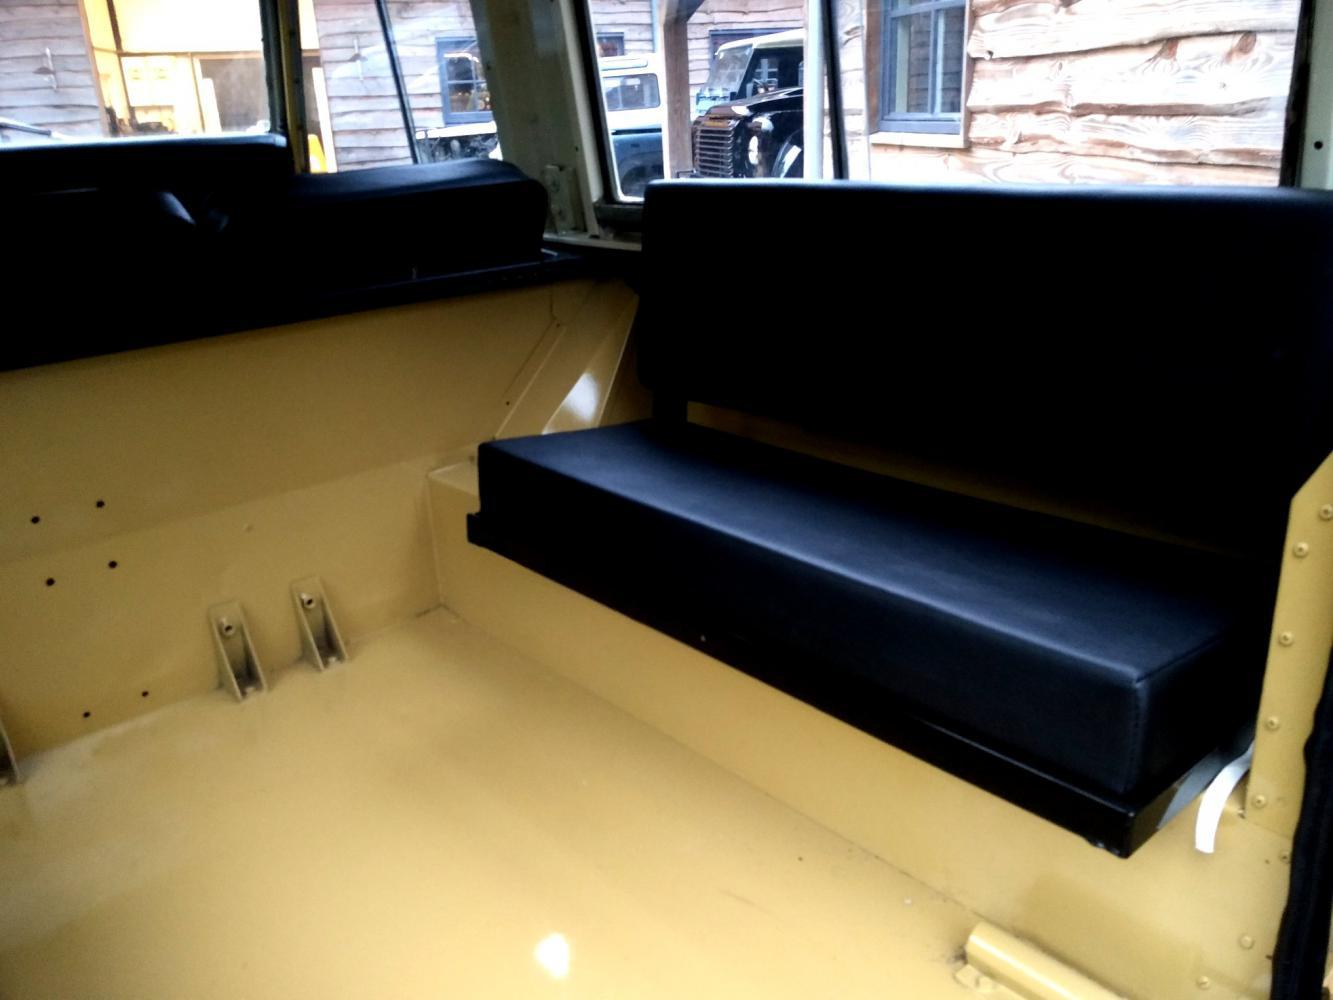 Click image for larger version  Name:1978 LR LHD Santana 88 Hardtop A Mustard Yellow loadfloor bench seat right.jpg Views:144 Size:90.6 KB ID:289945